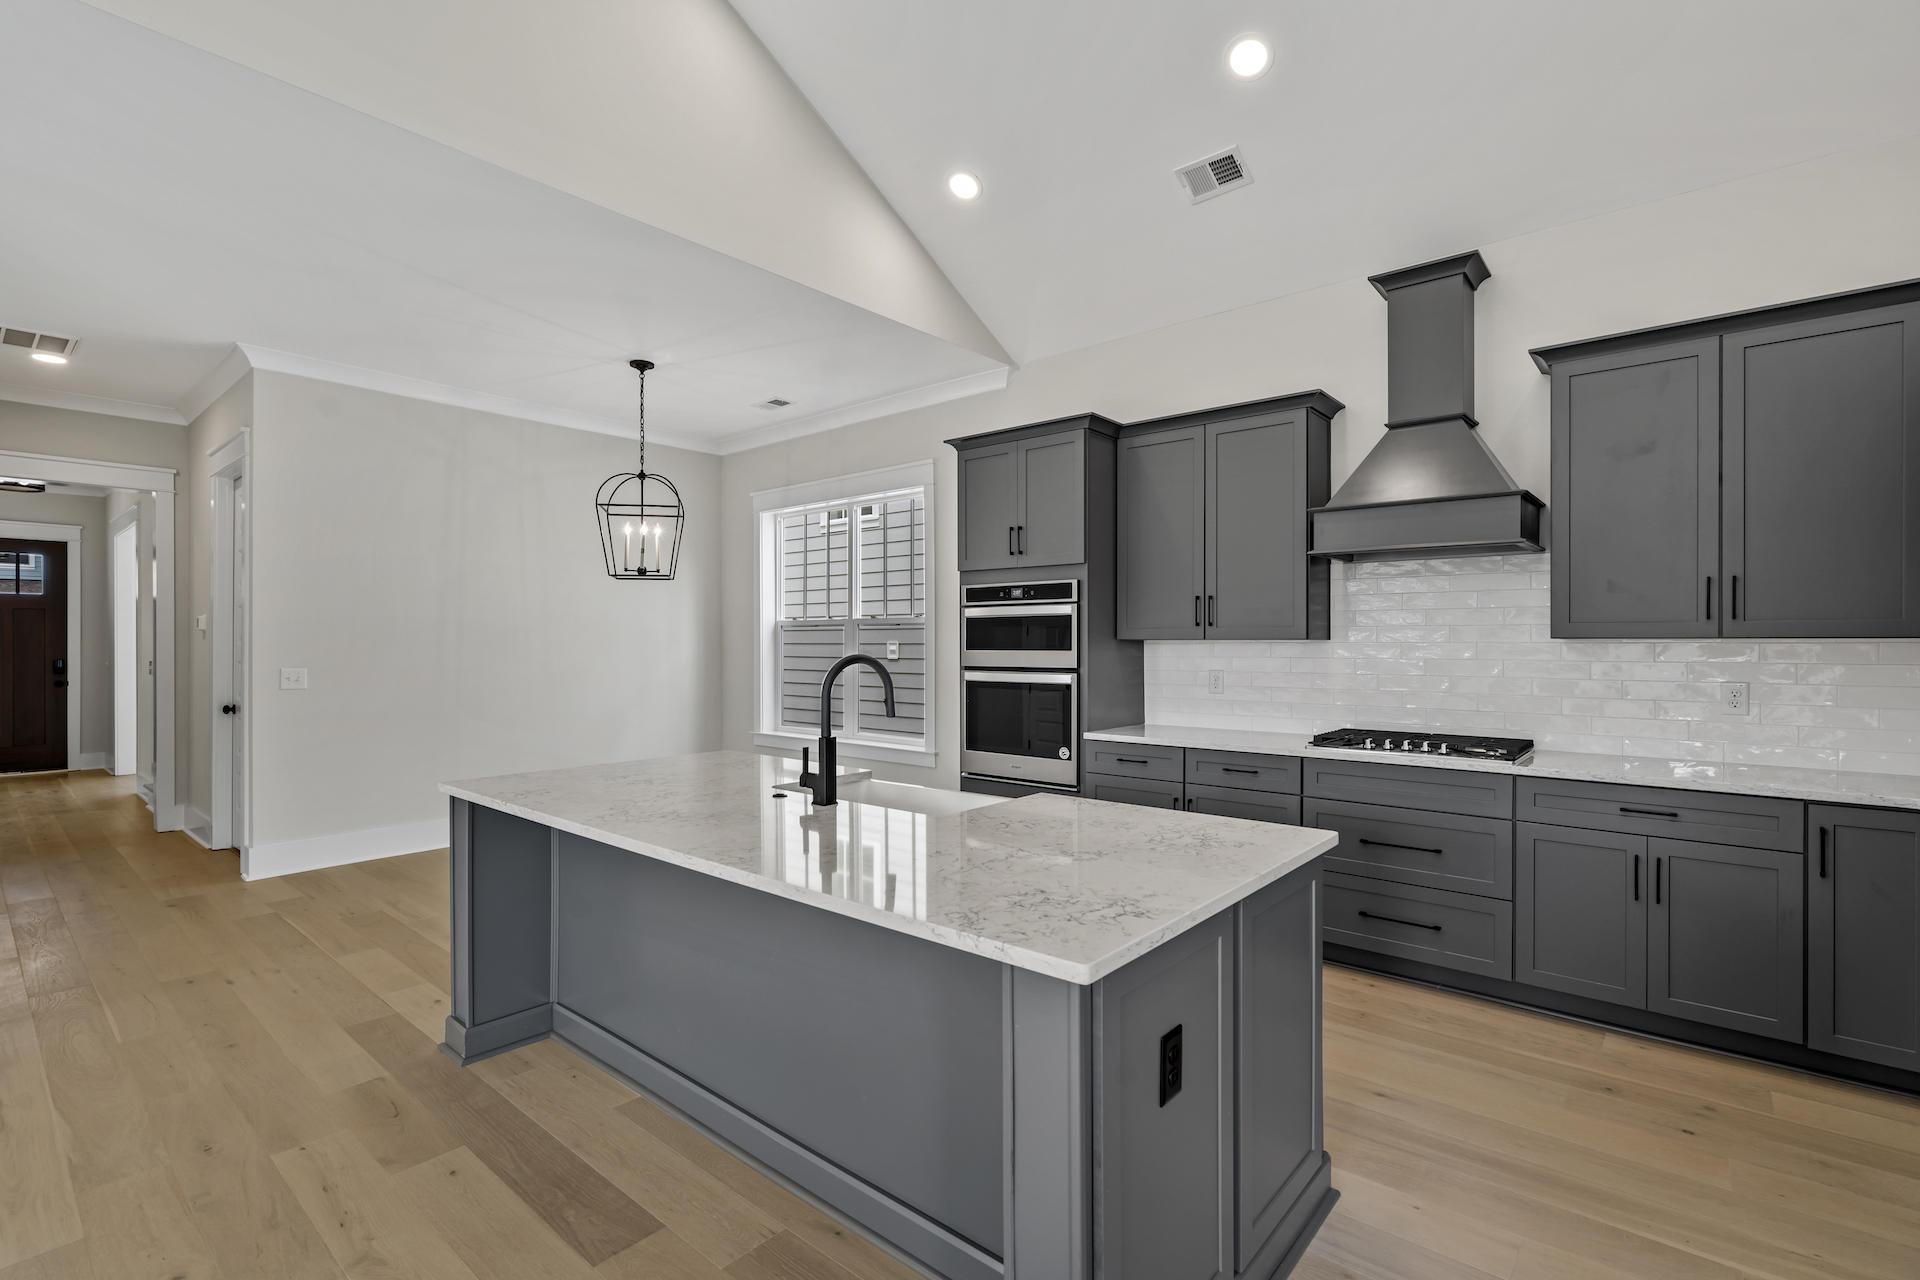 Midtown Homes For Sale - 1320 Upper Union, Mount Pleasant, SC - 8